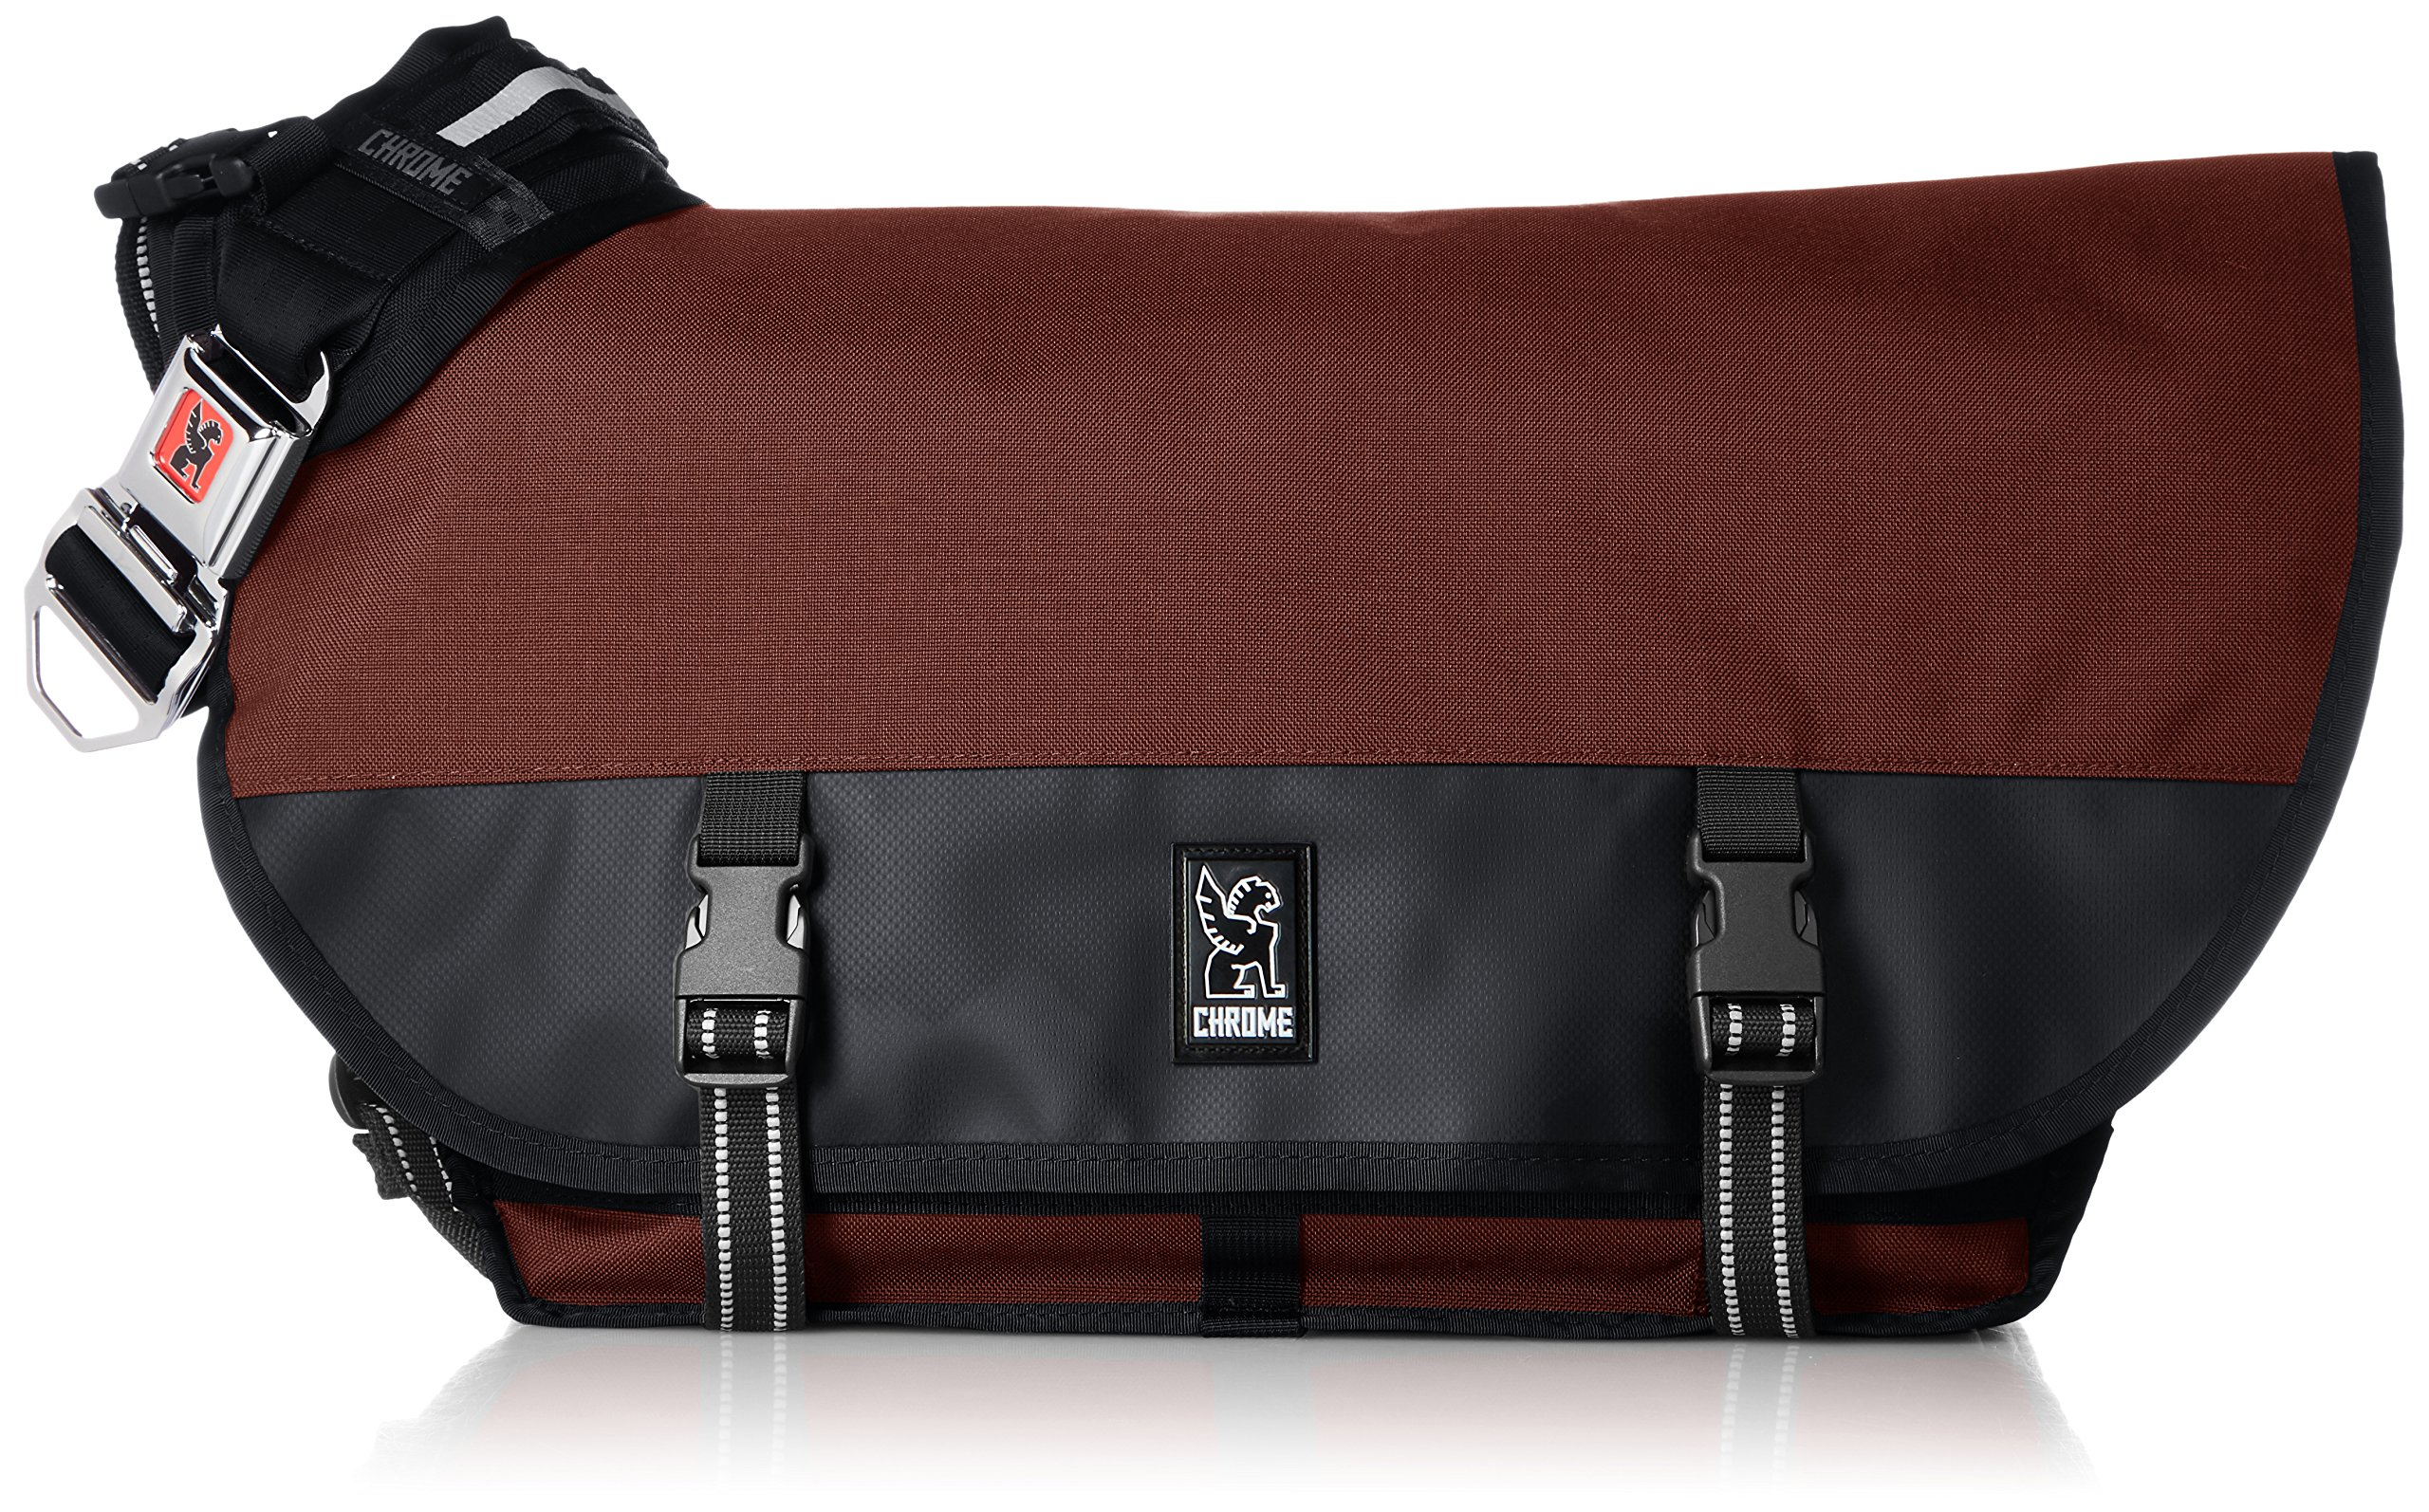 Chrome BG-002-BRIK Brick/Black One Size Citizen Messenger Bag Chrome Buckle